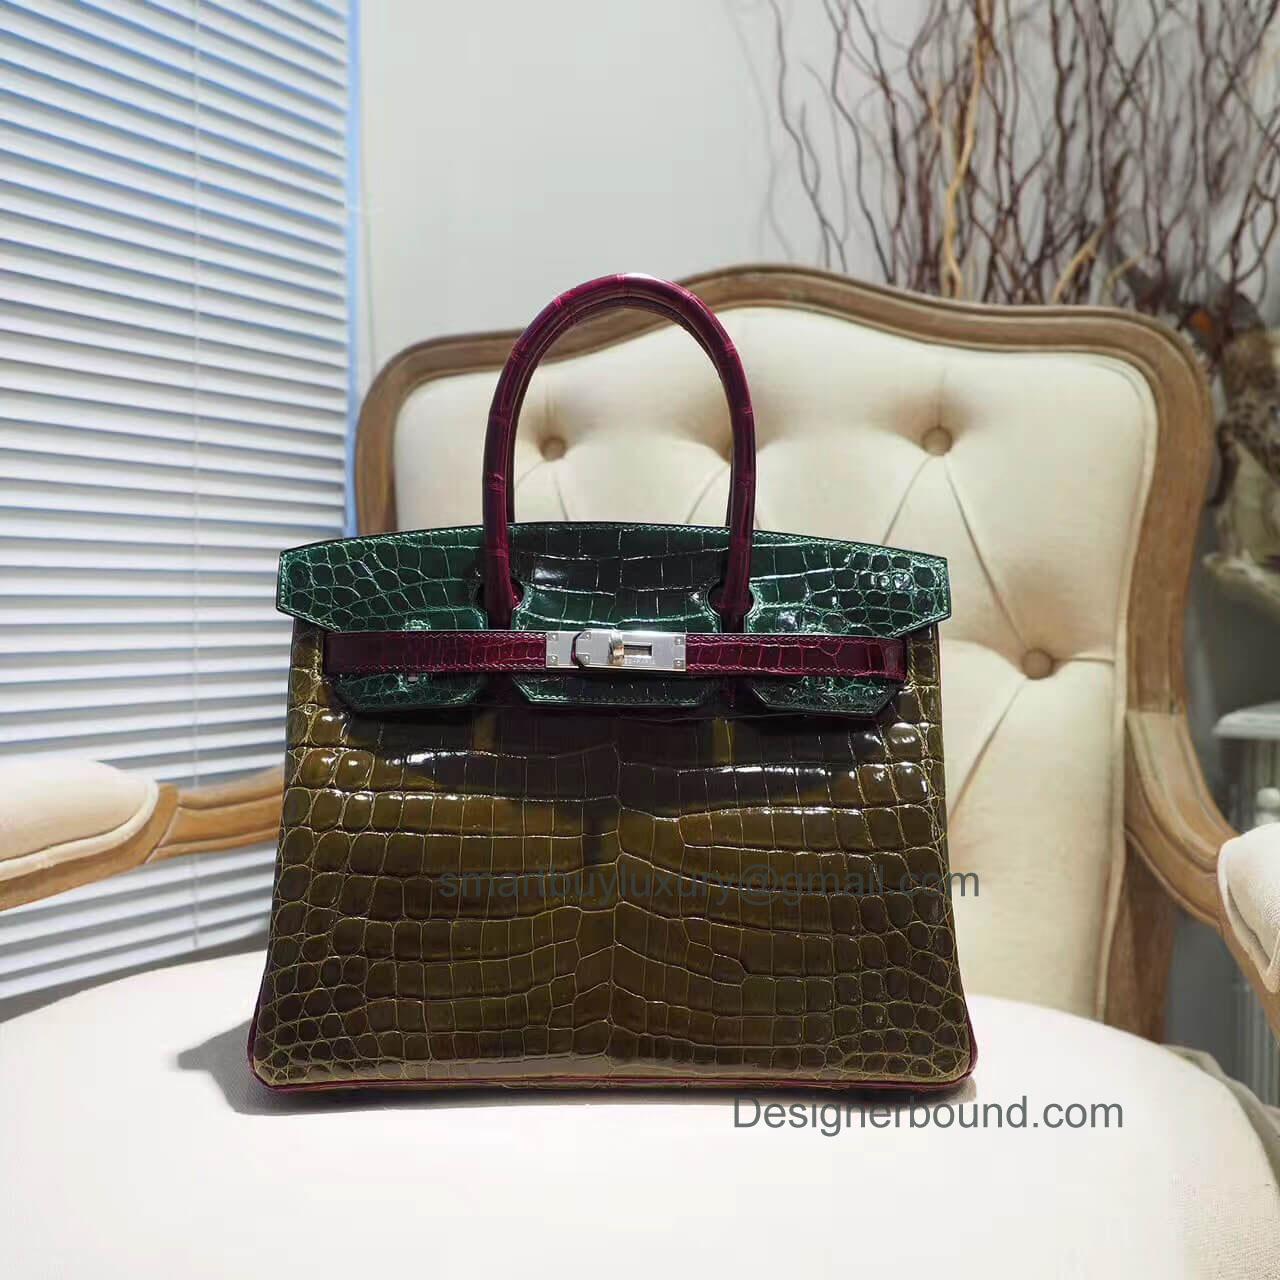 34082b3c03 Hermes Birkin 30 Bag in Tricolored Vert Fonce Shiny Nile Croc PHW